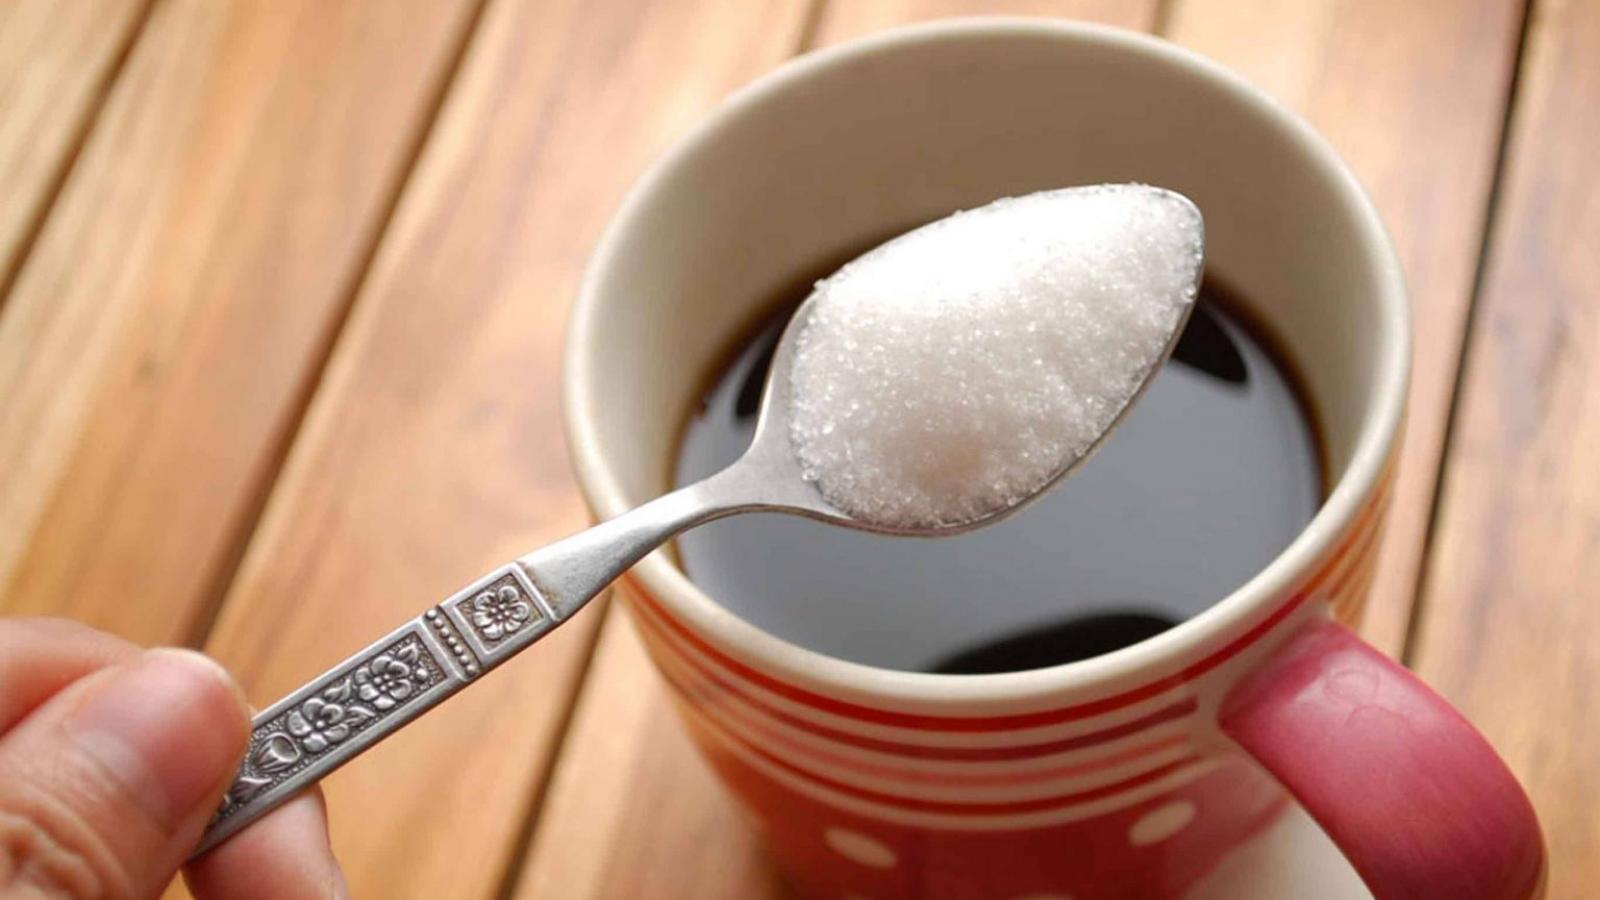 Вологжане злоупотребляют сахаром